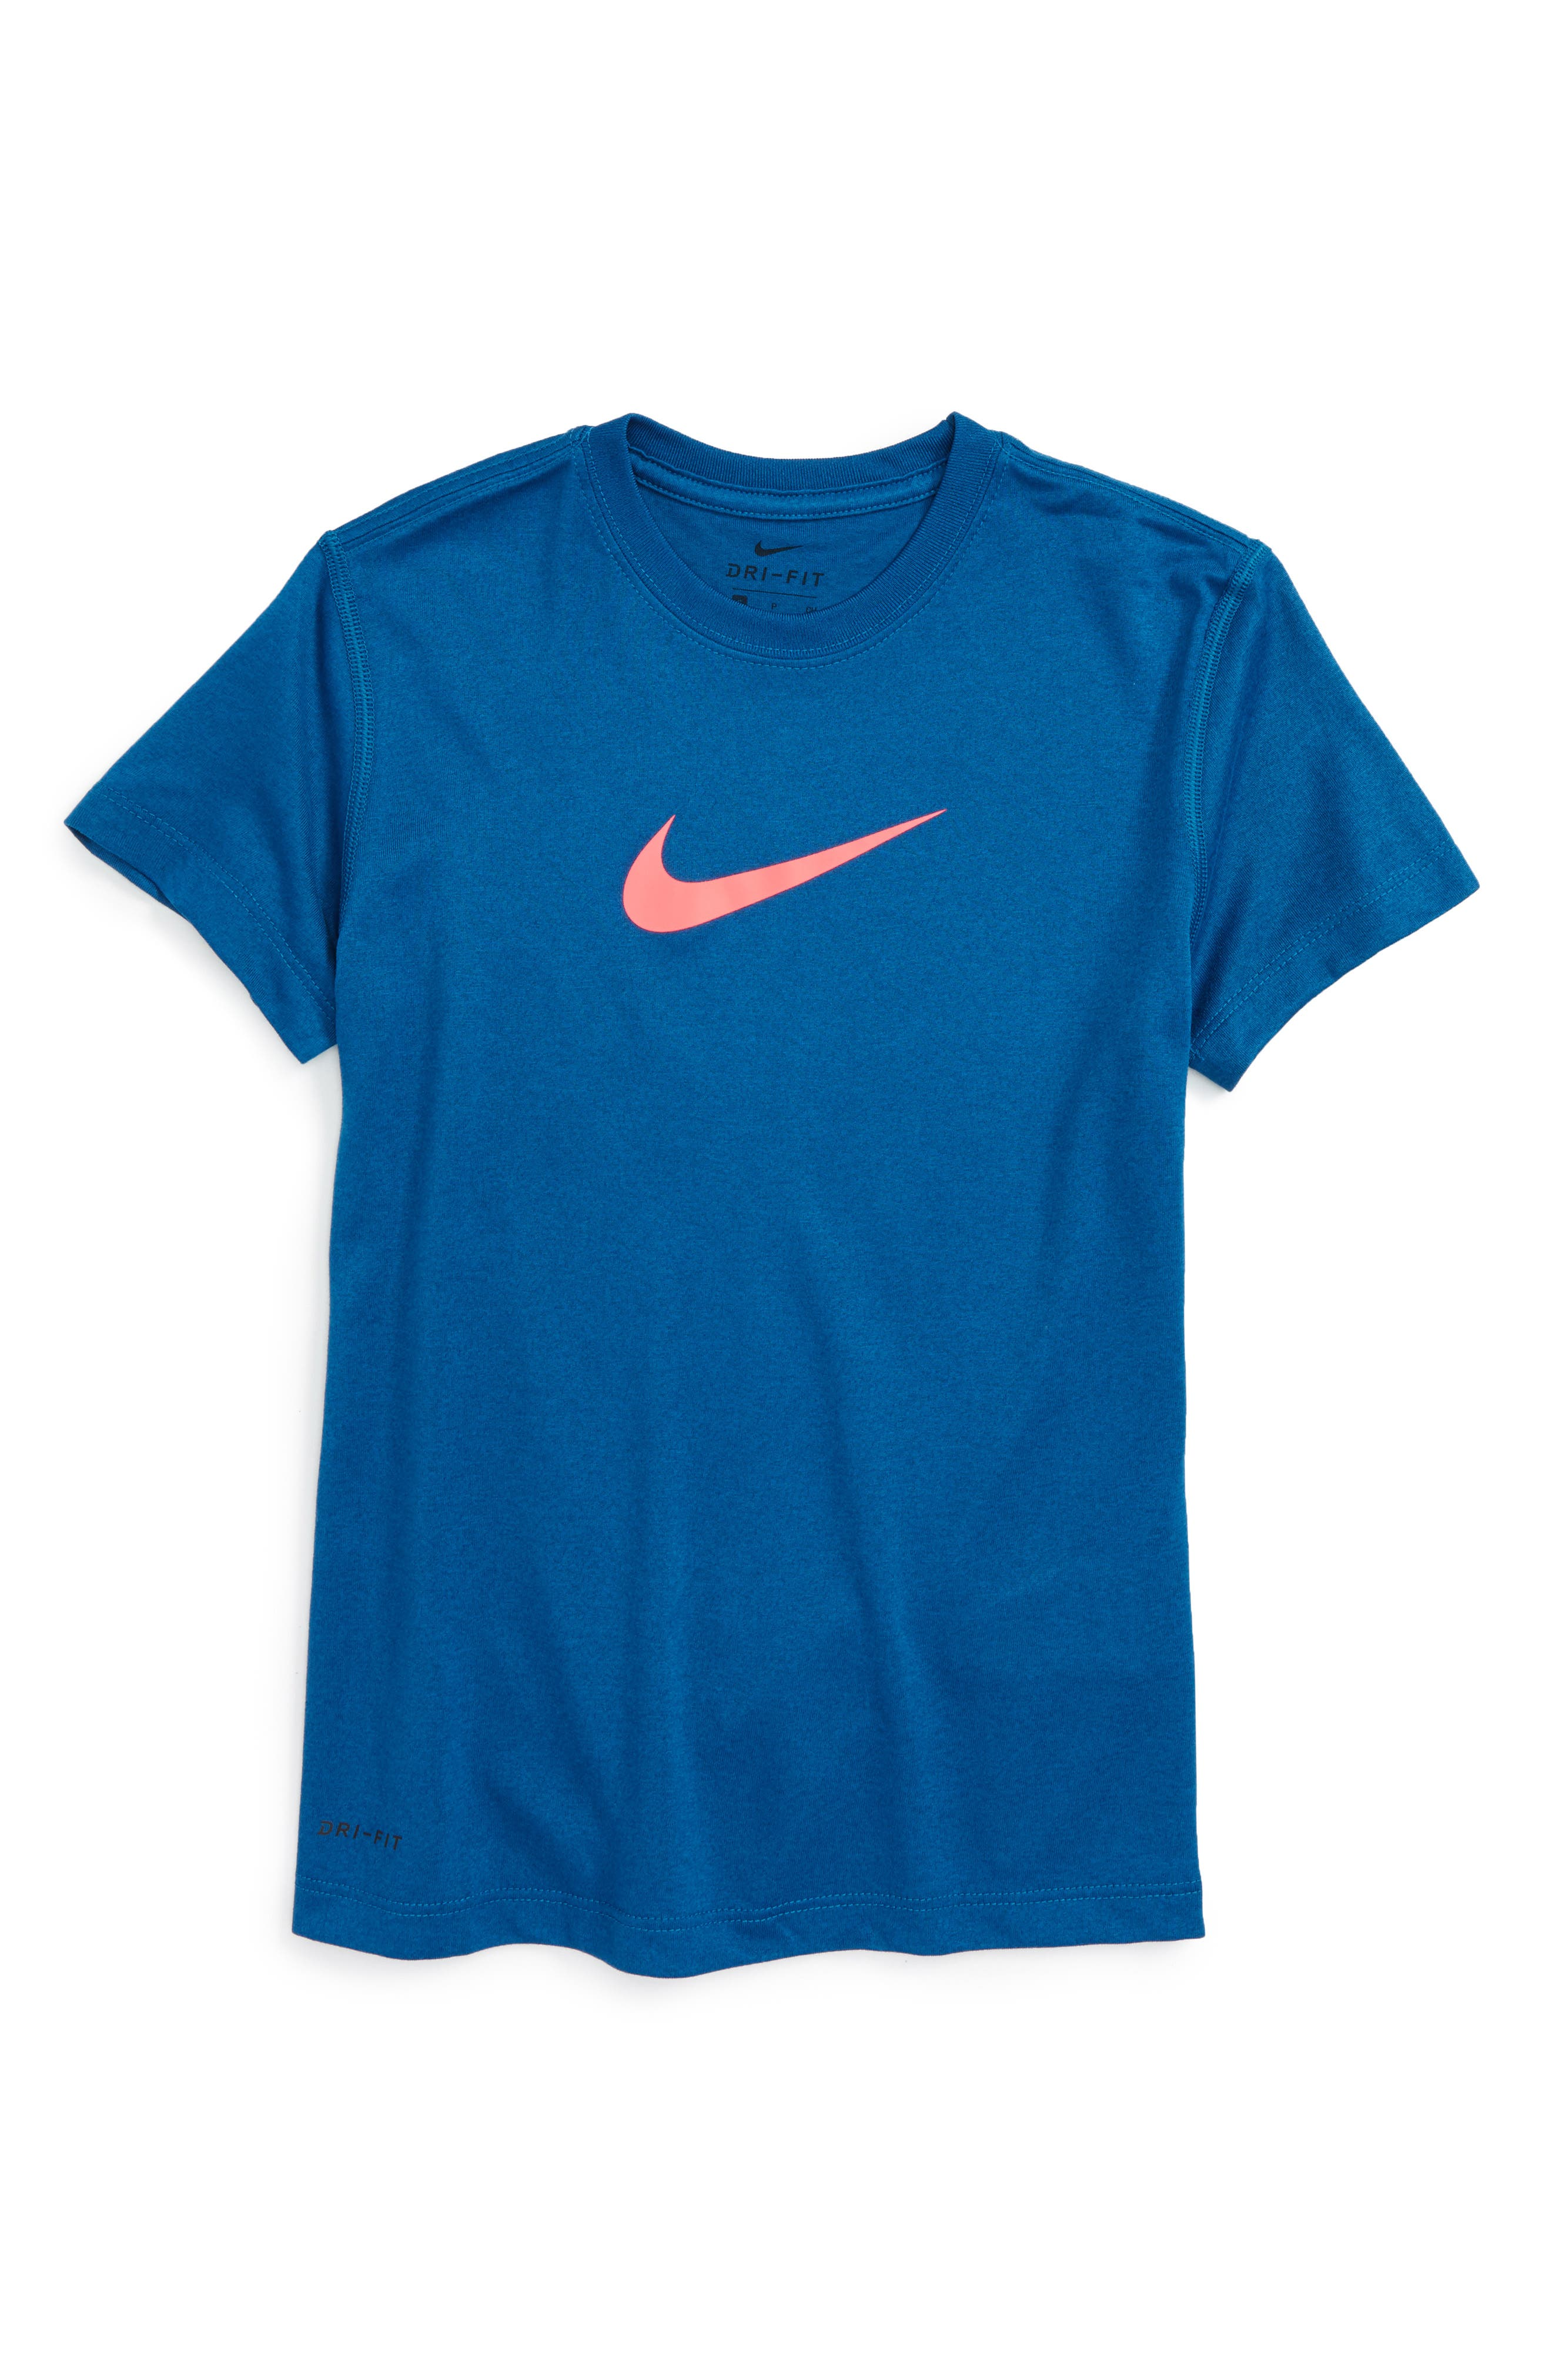 Main Image - Nike 'Legend' Top (Big Girls)(Online Only)